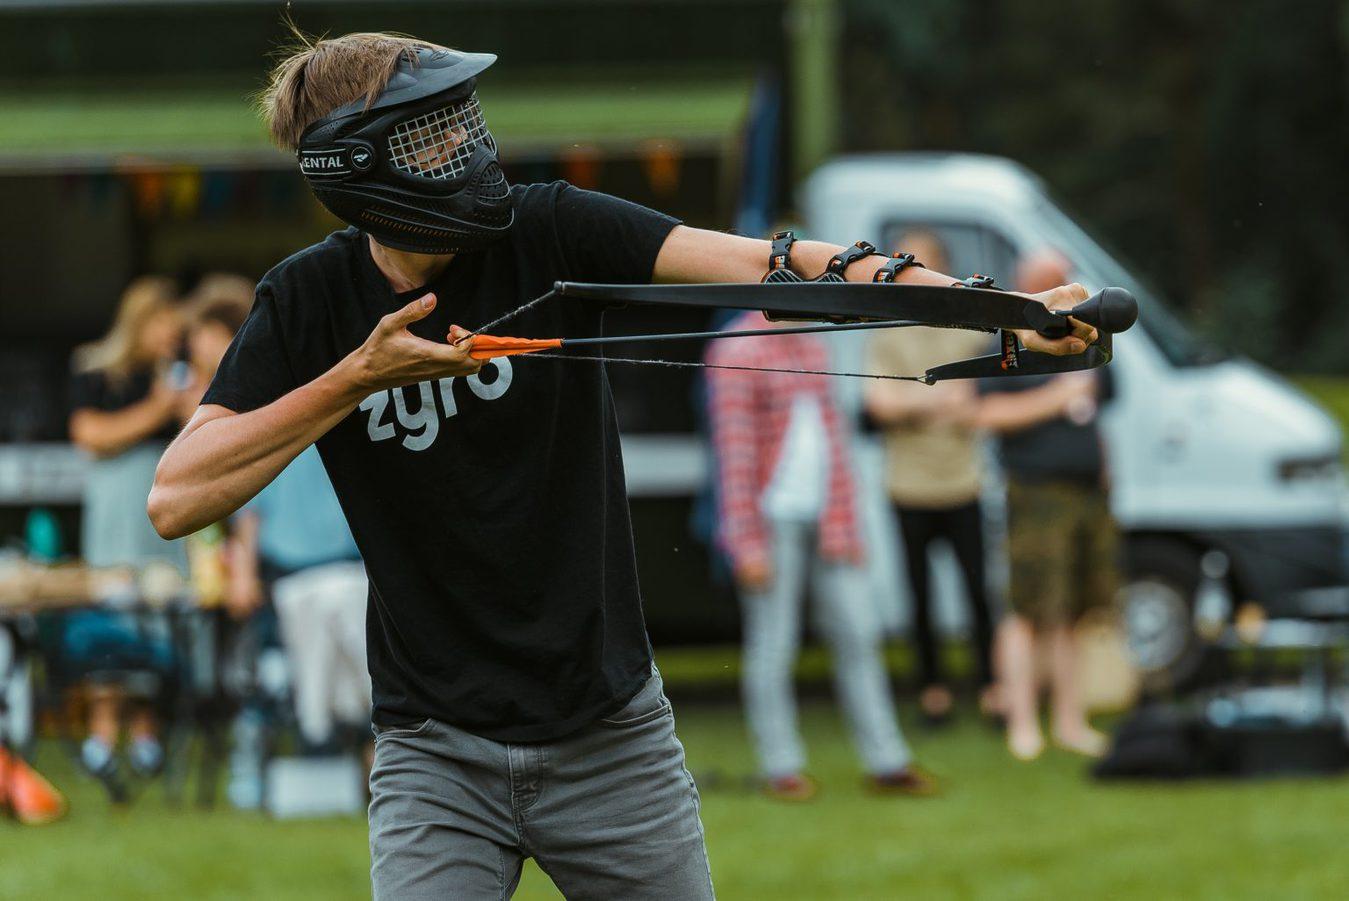 Zyro Event Archery